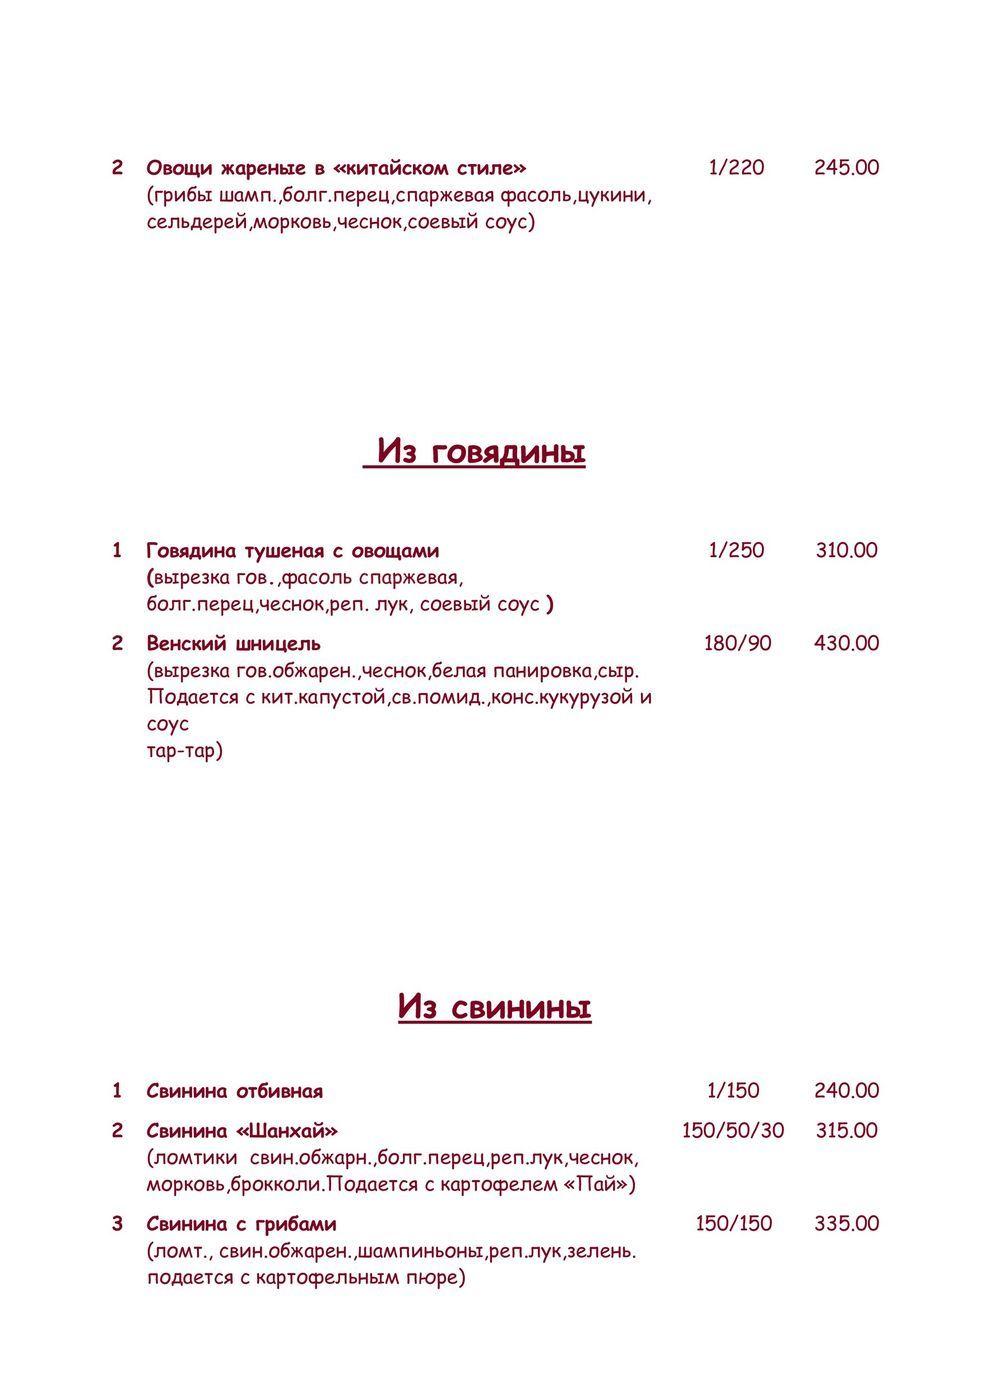 Меню кафе Мельба на улице Кирова фото 7